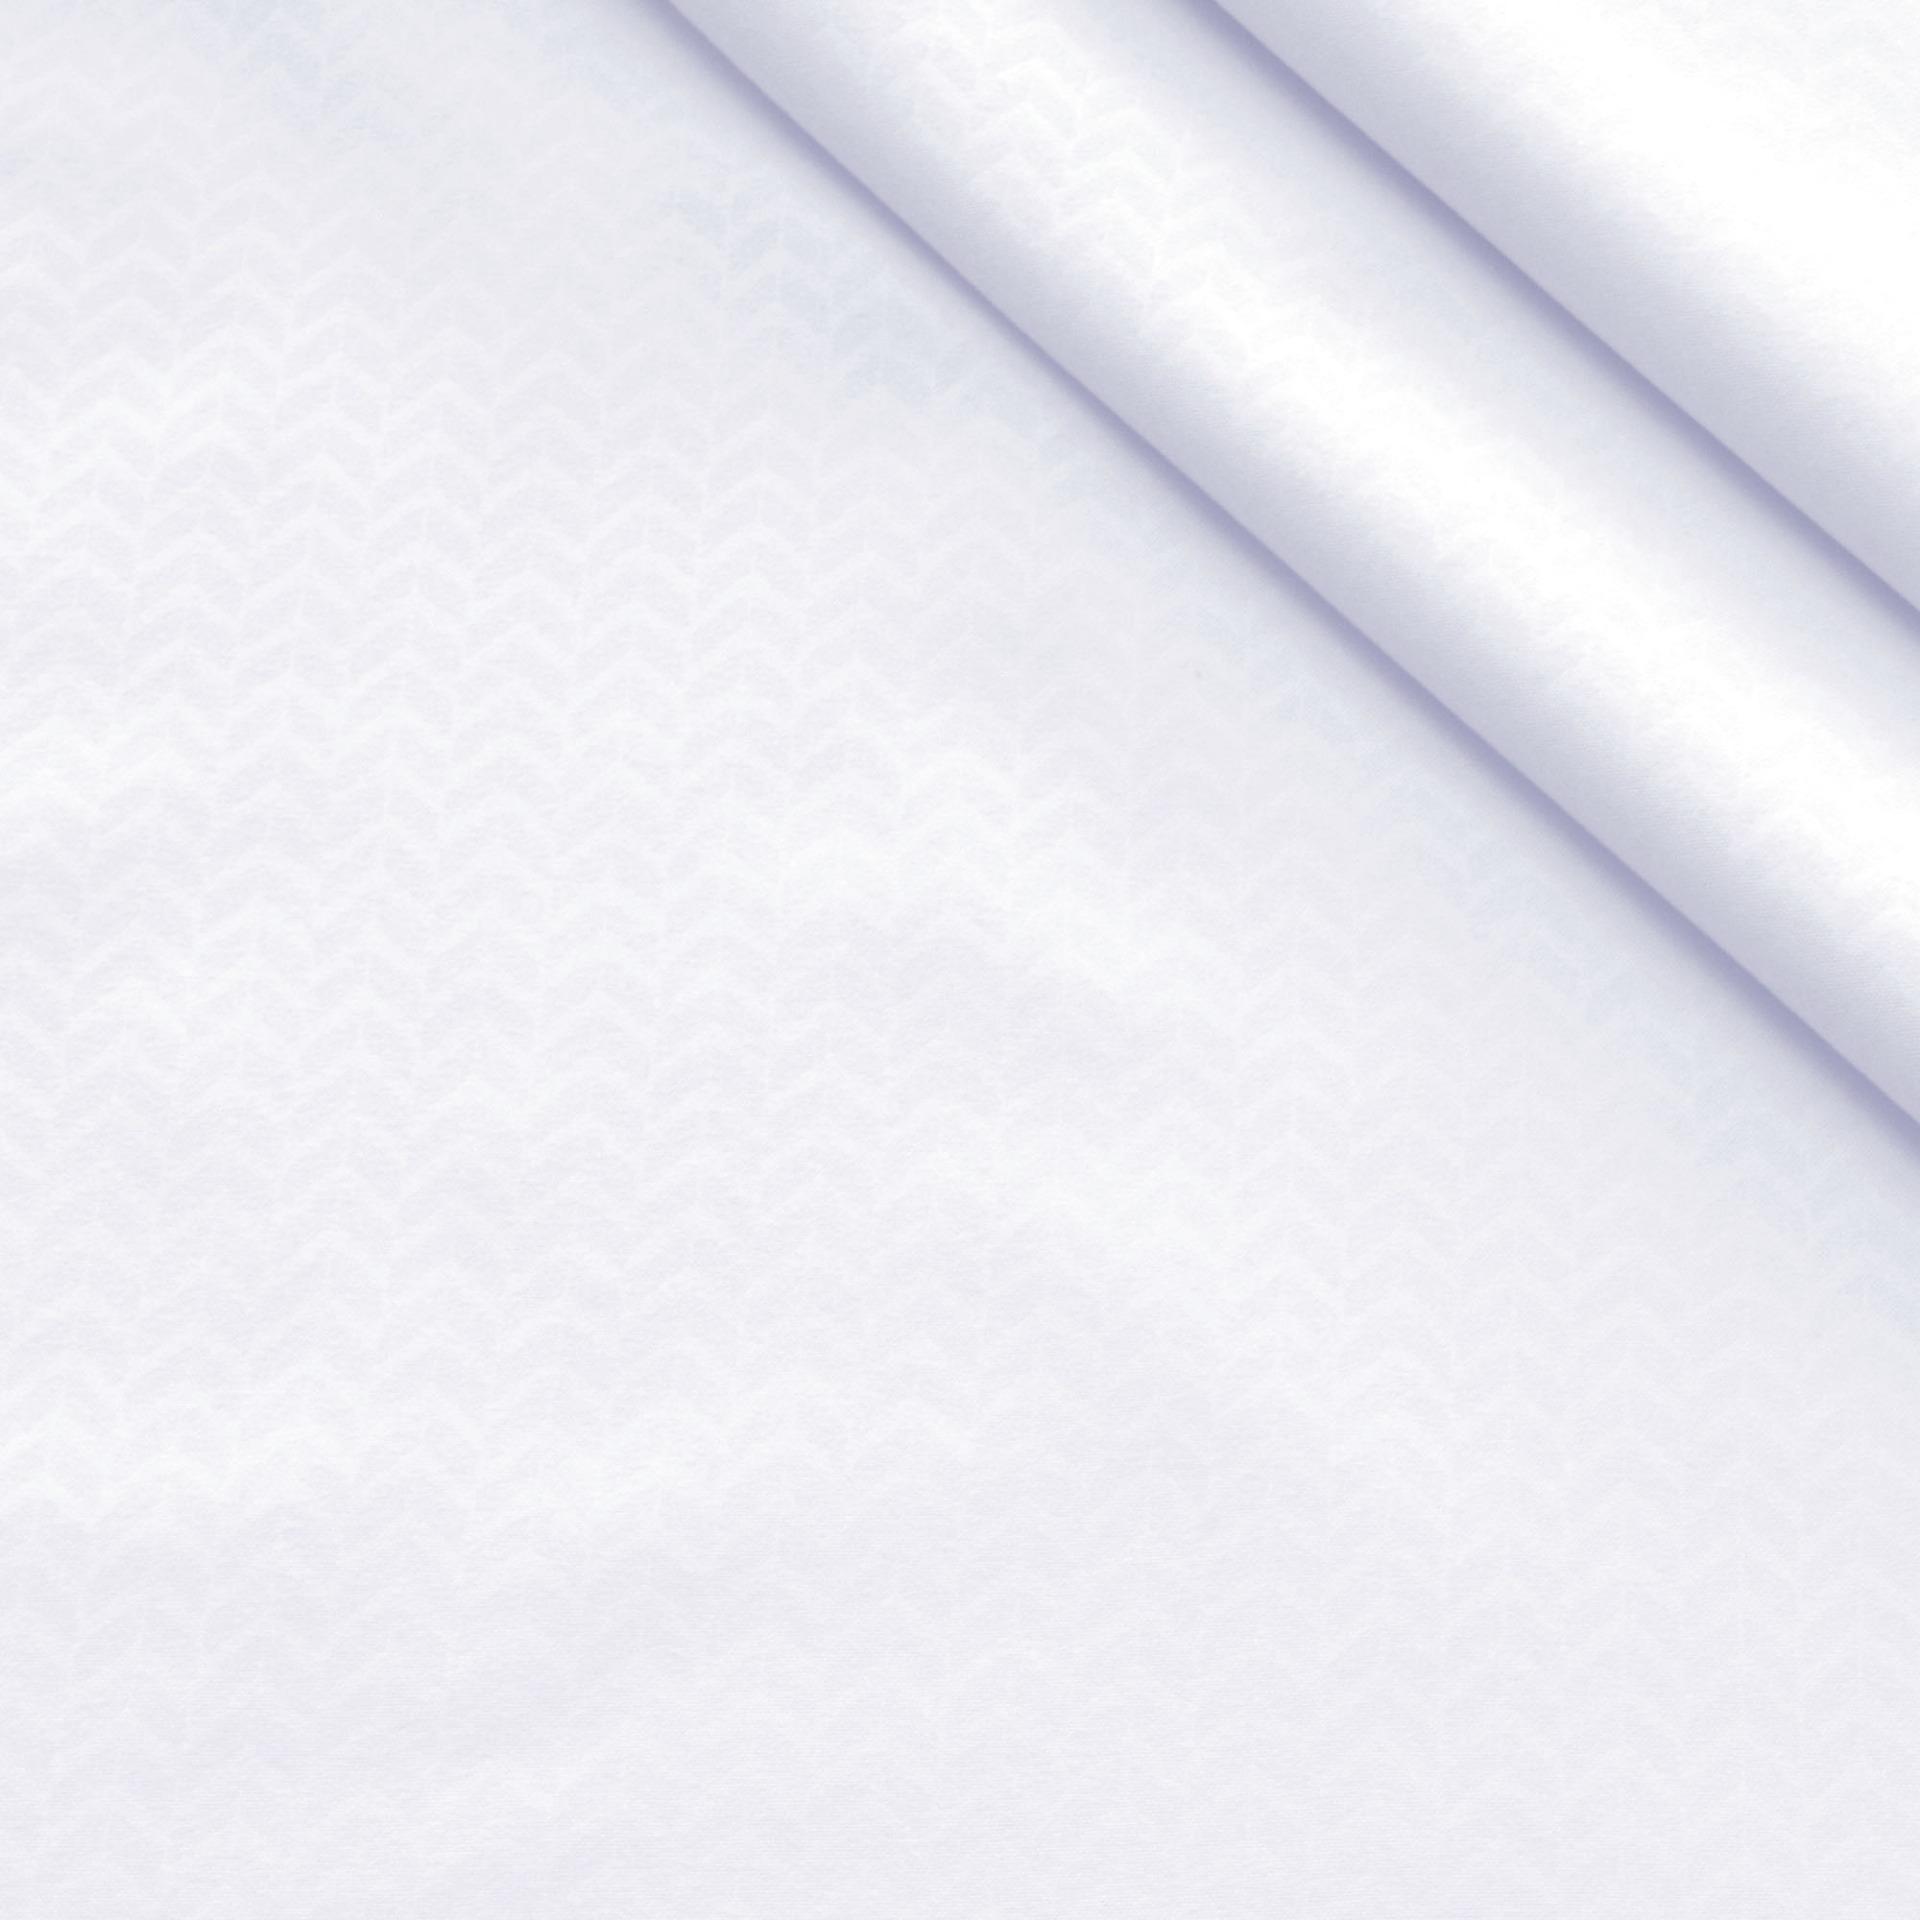 Essina Watermark Microfiber Plush Fitted Bedsheet Cadar Plain Color King / Queen / Super Single